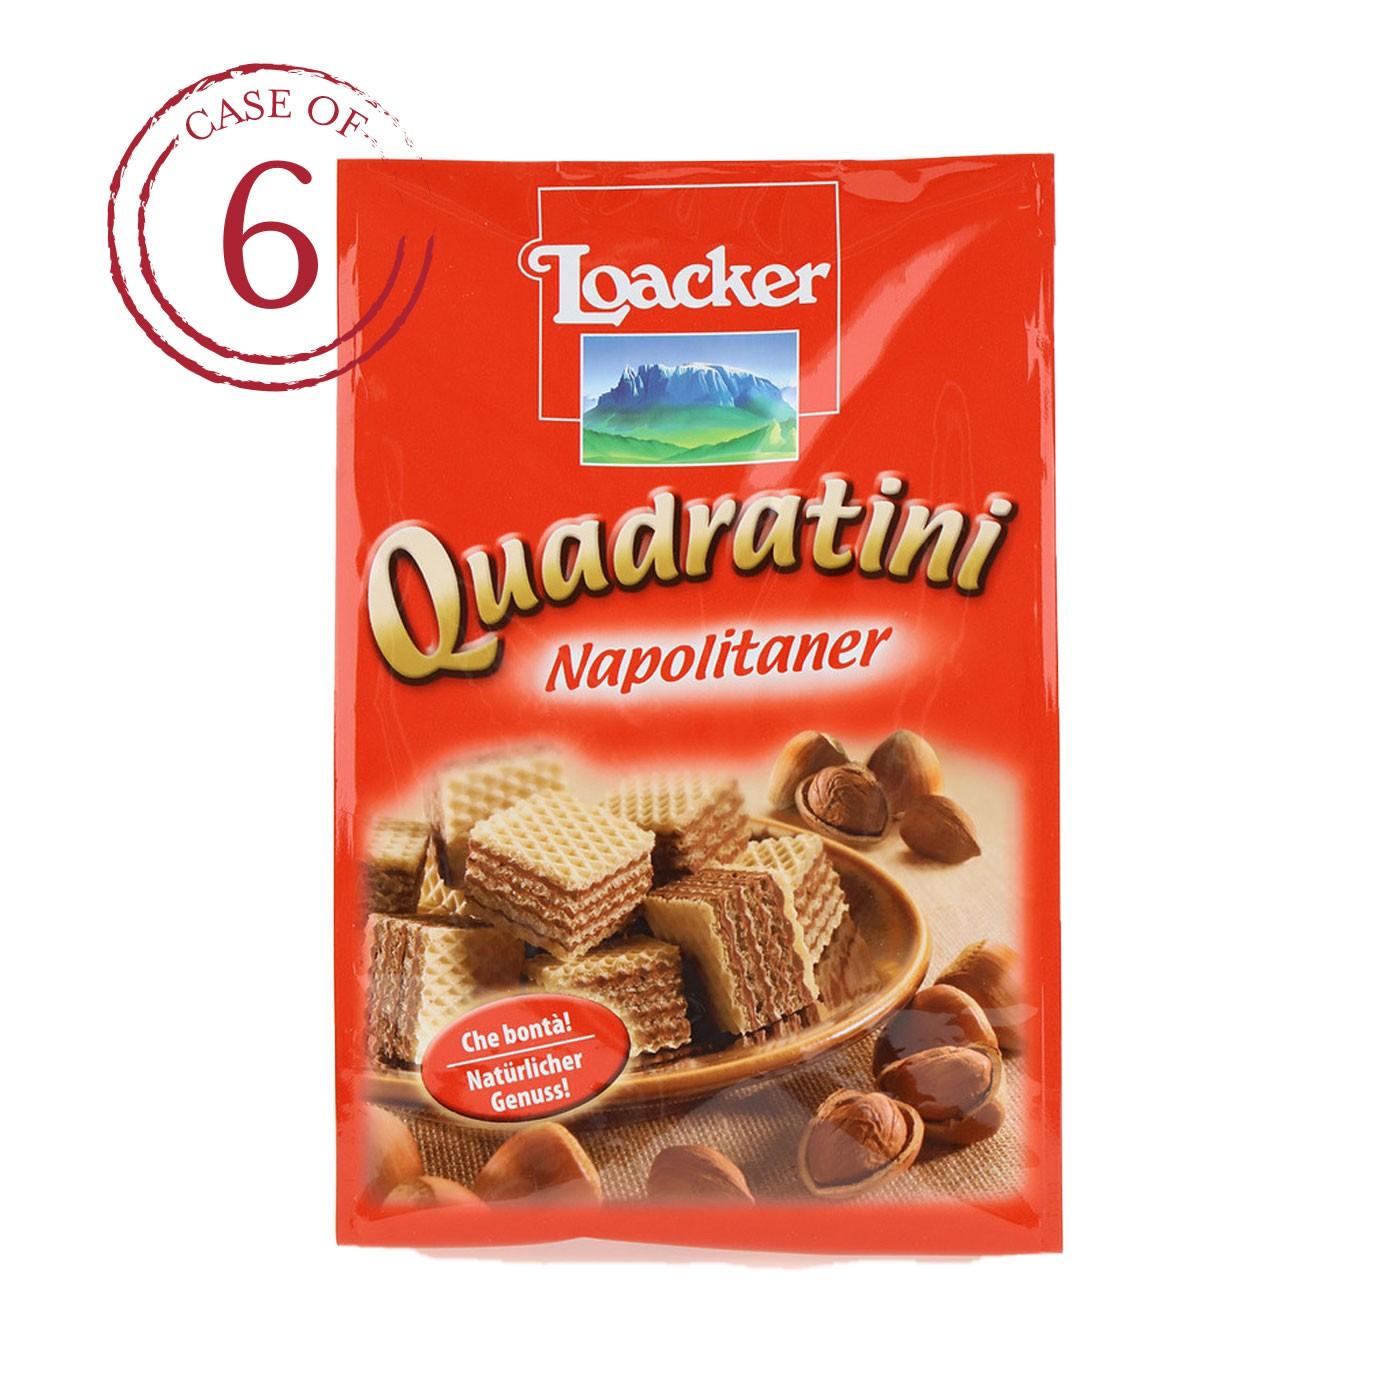 Hazelnut Quadratini 8.8 oz - Case of 6